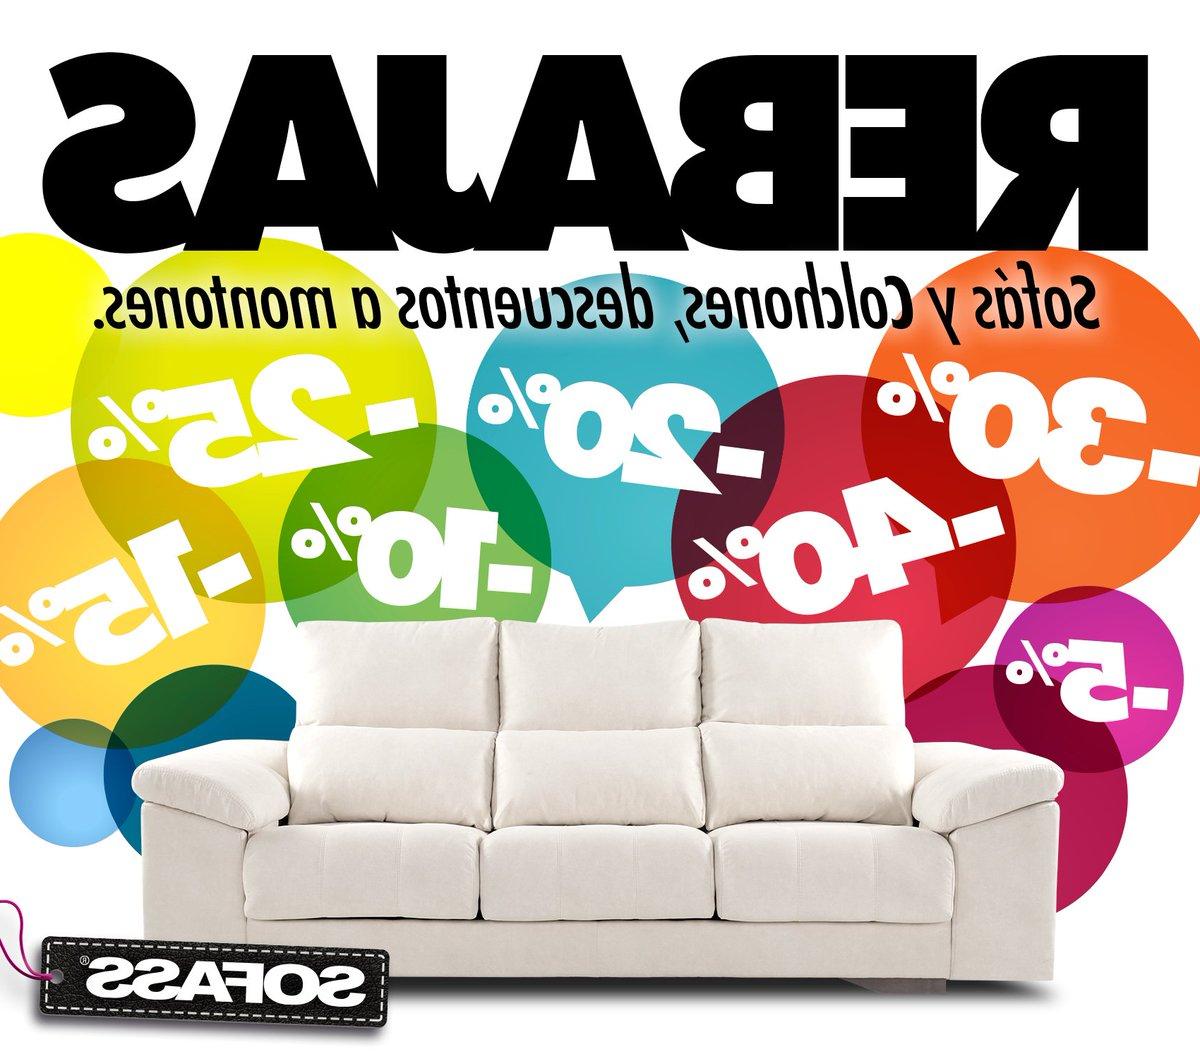 Rebajas sofas Tldn Big sofass Mà Laga Pà Rebajas sofà S Y Colchones